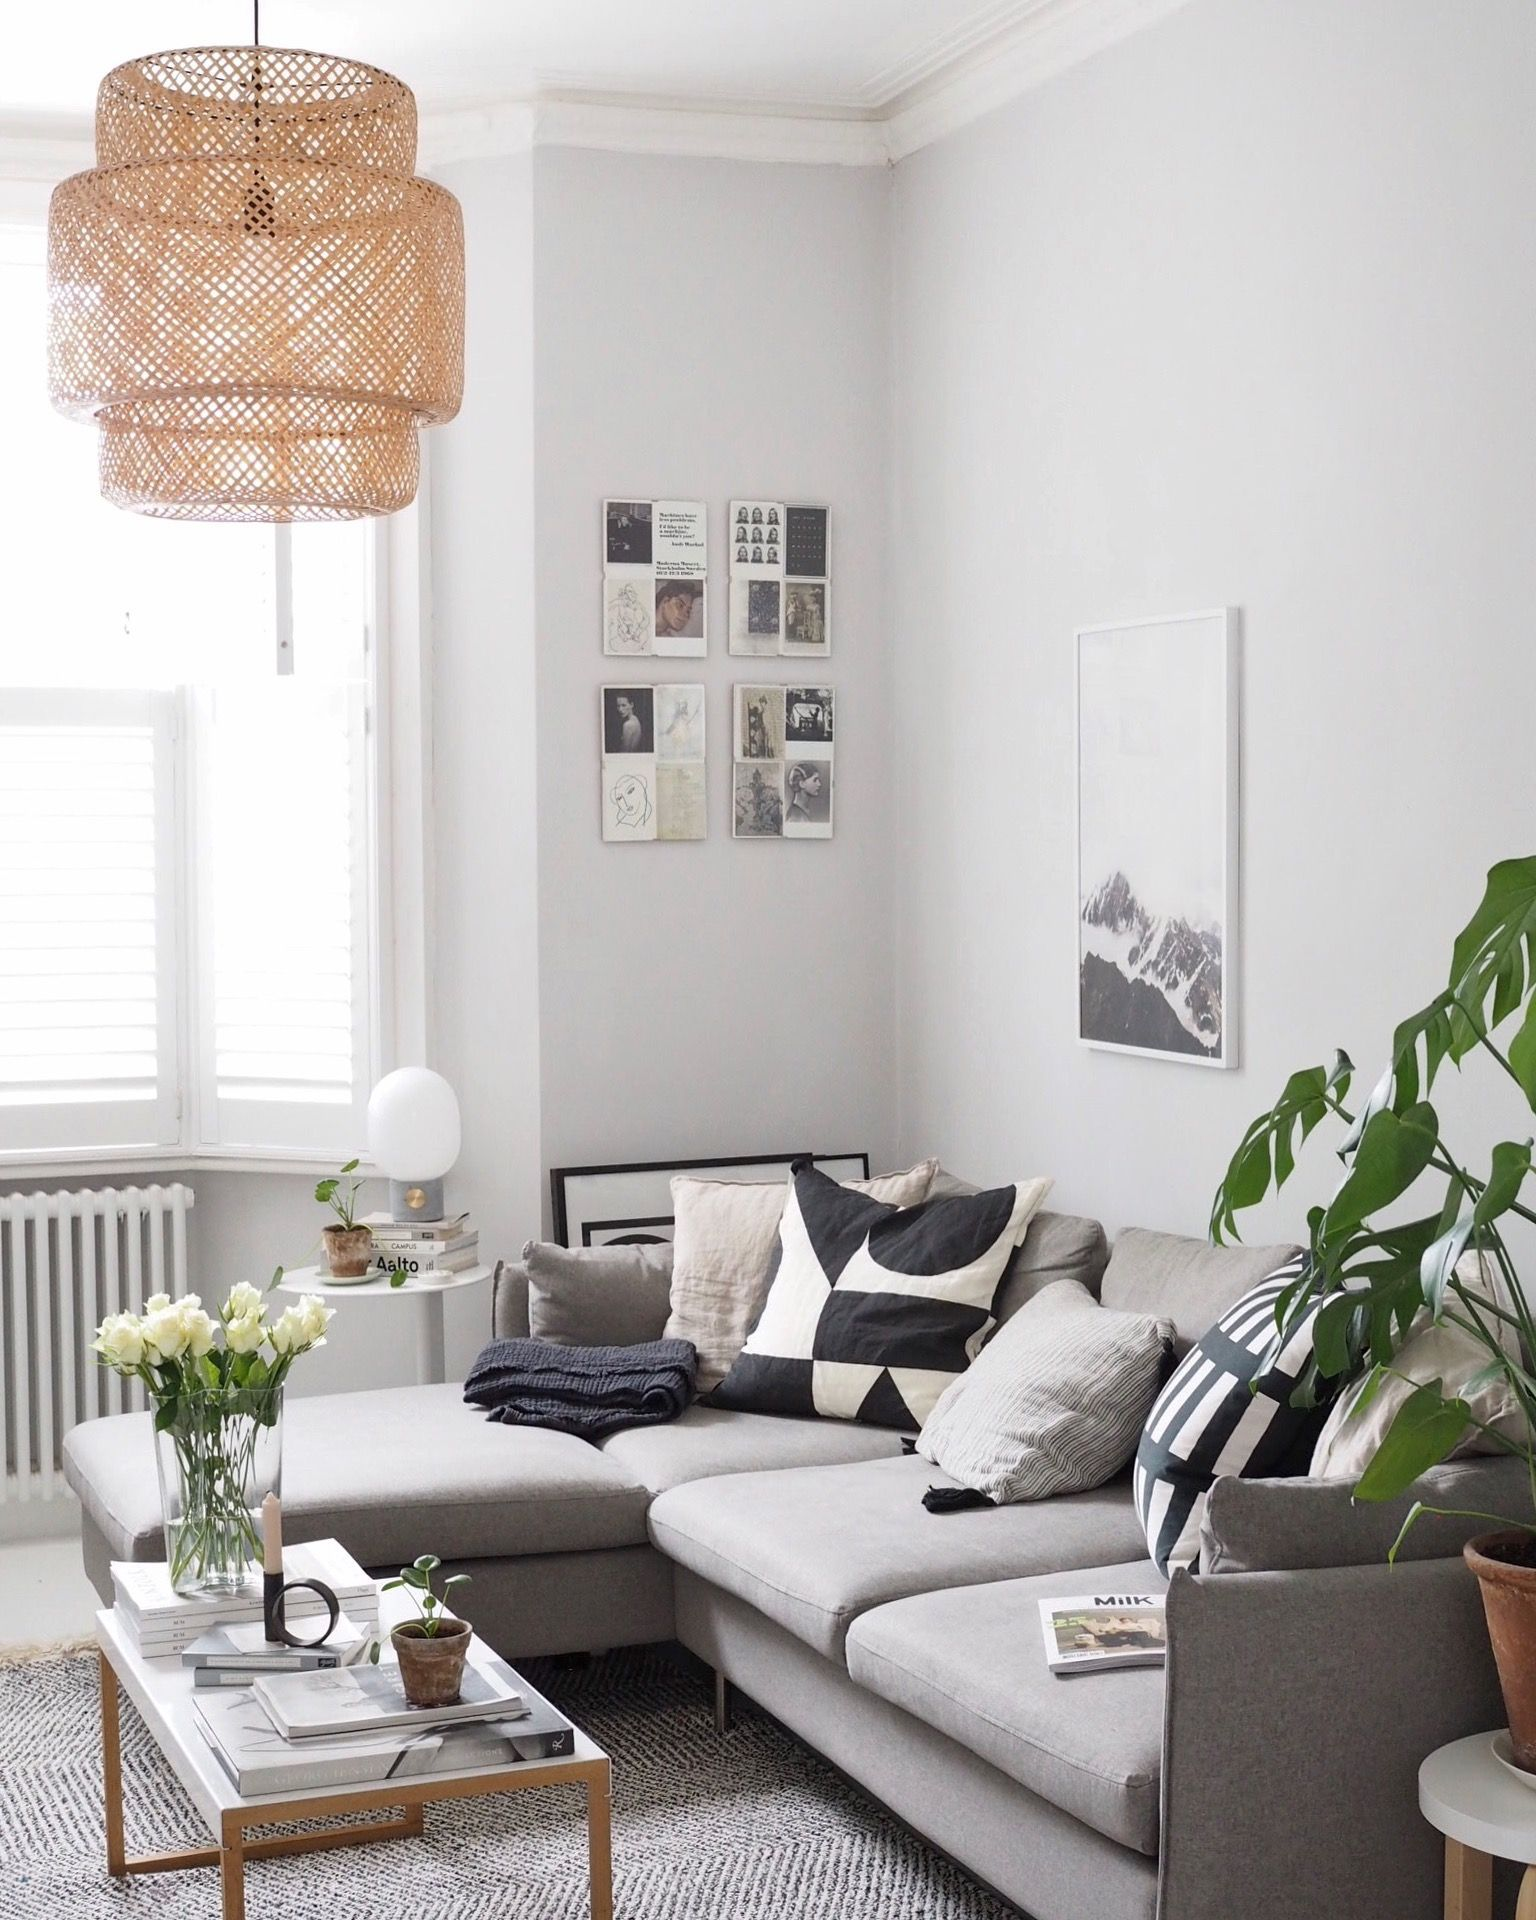 Inside My Home In 2020 Living Room Scandinavian Nordic Living Room Small Living Rooms Living Room Scandinavian Nordic Living Room Small Living Rooms Around my living room